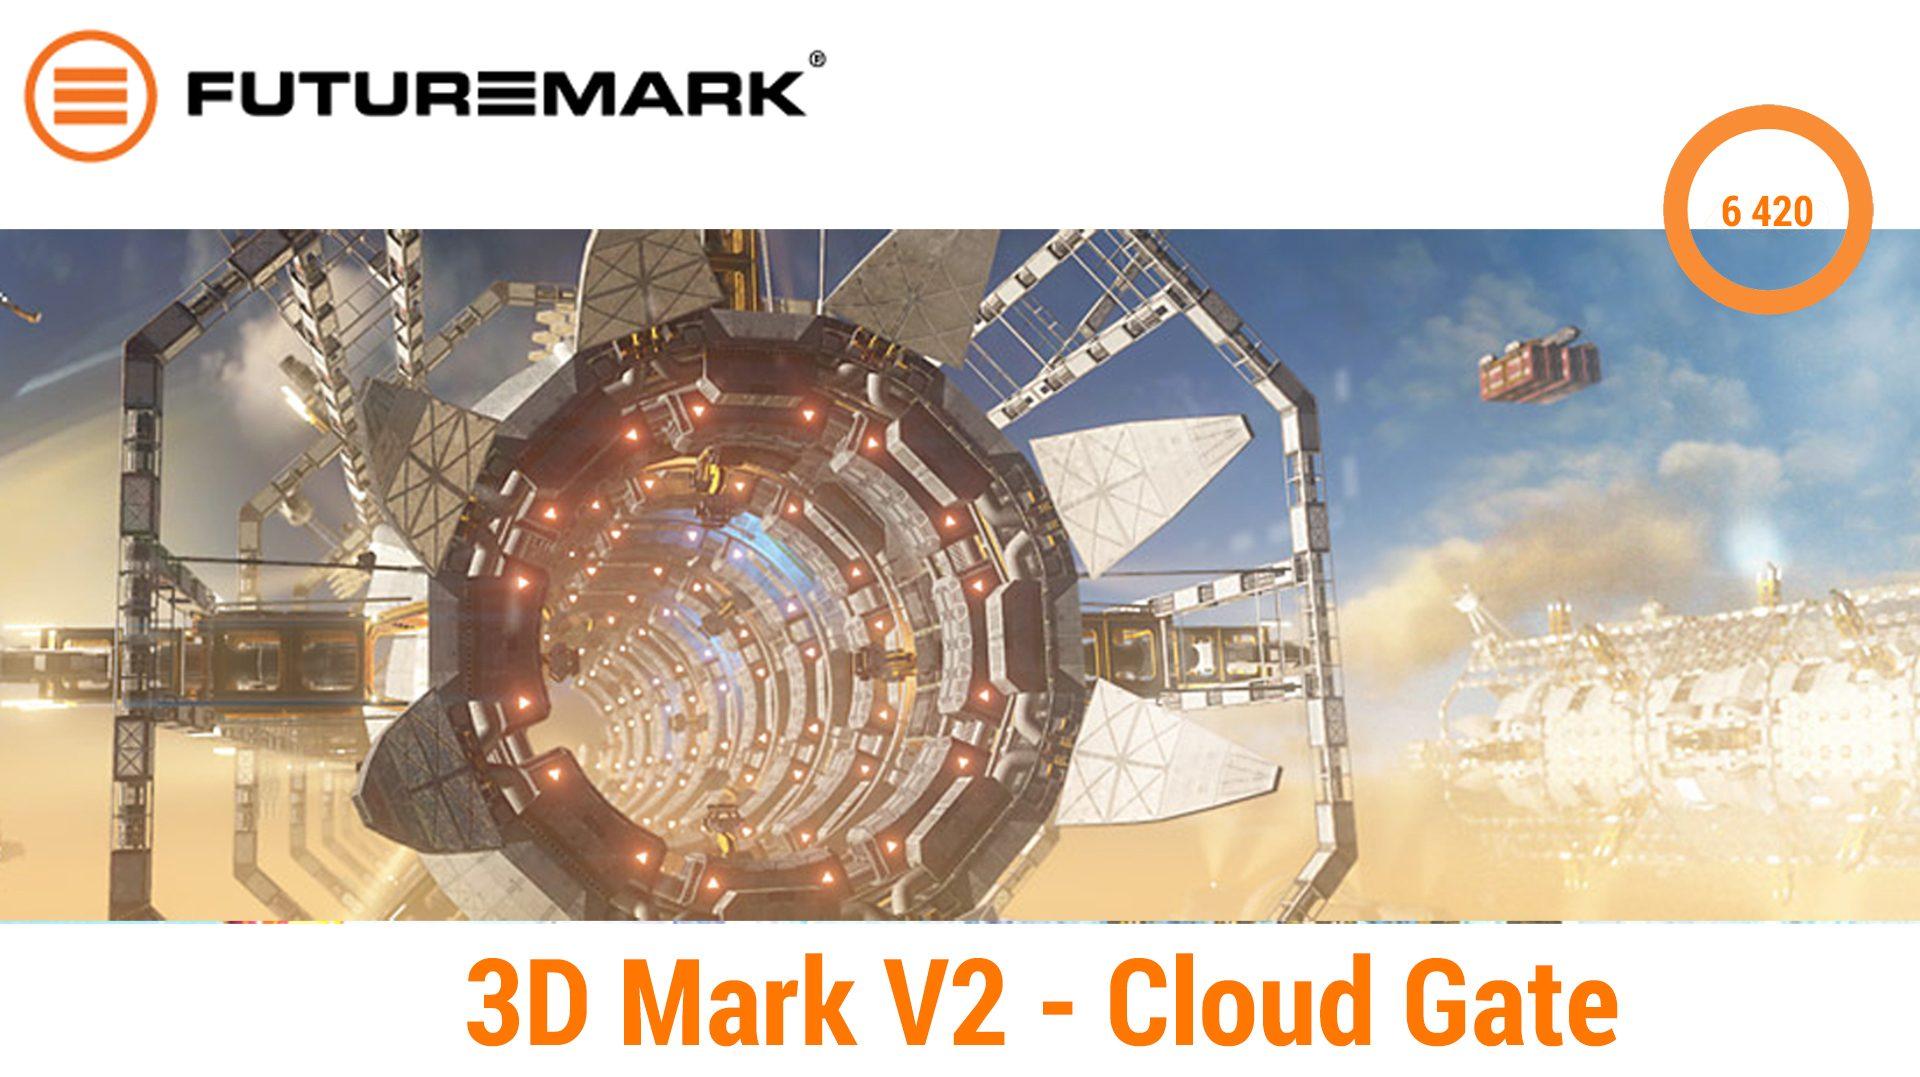 HP-Spectre-x360-15-ap006ng-3D-Mark-V2—Cloud-Gate-2